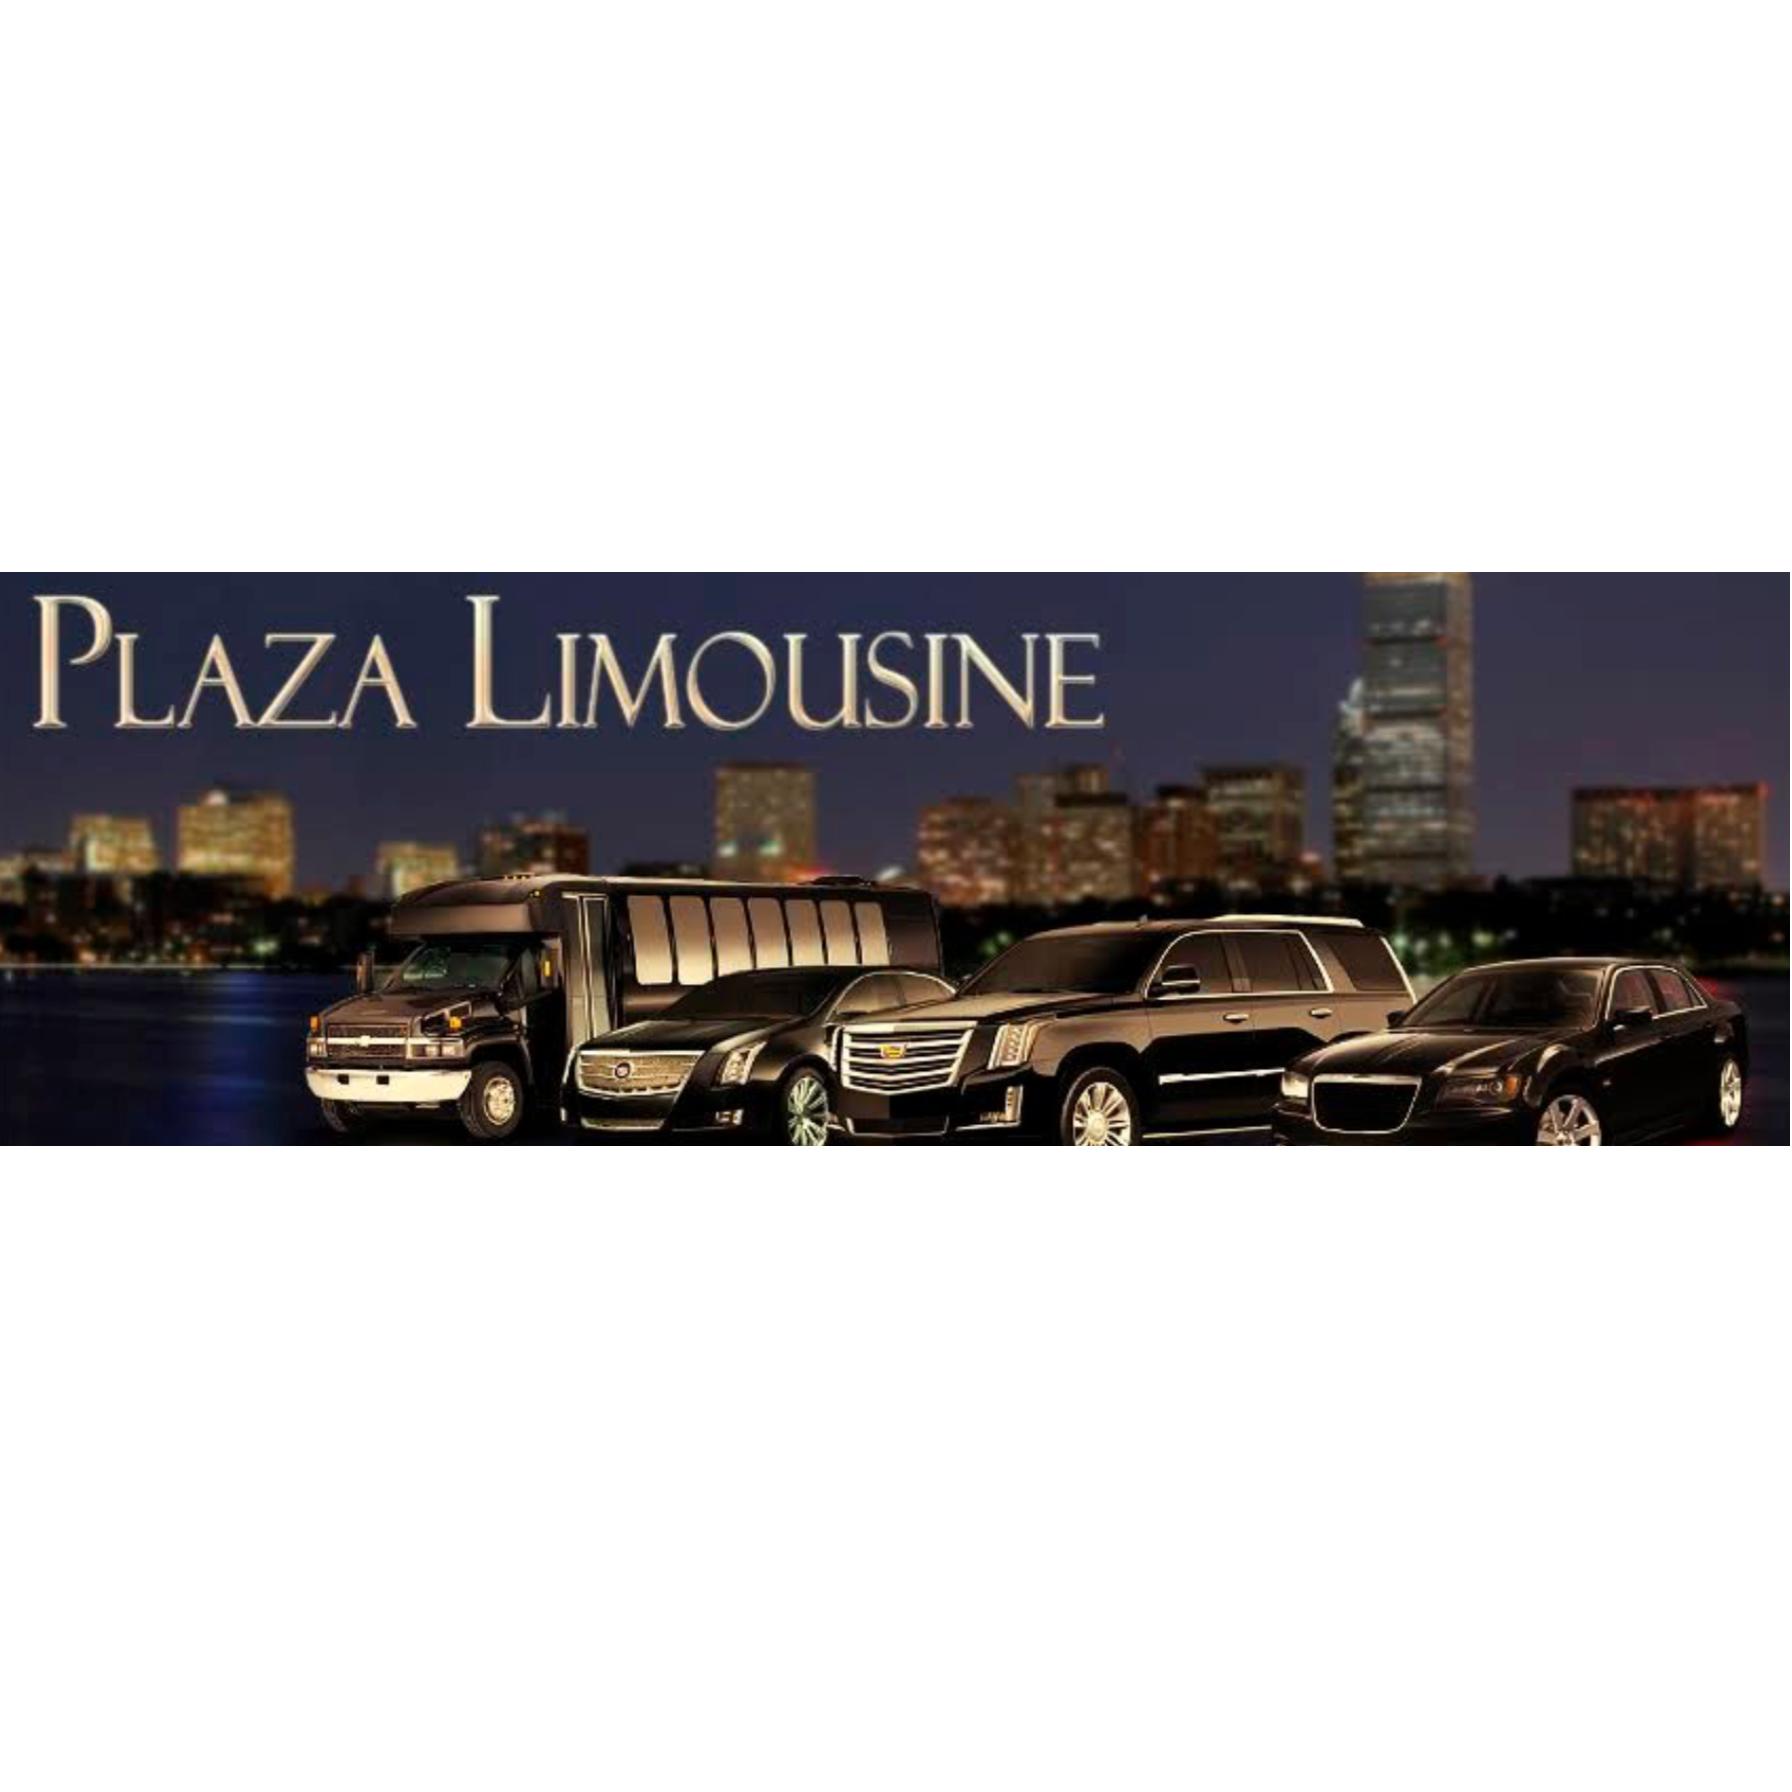 Plaza Limousine LTD